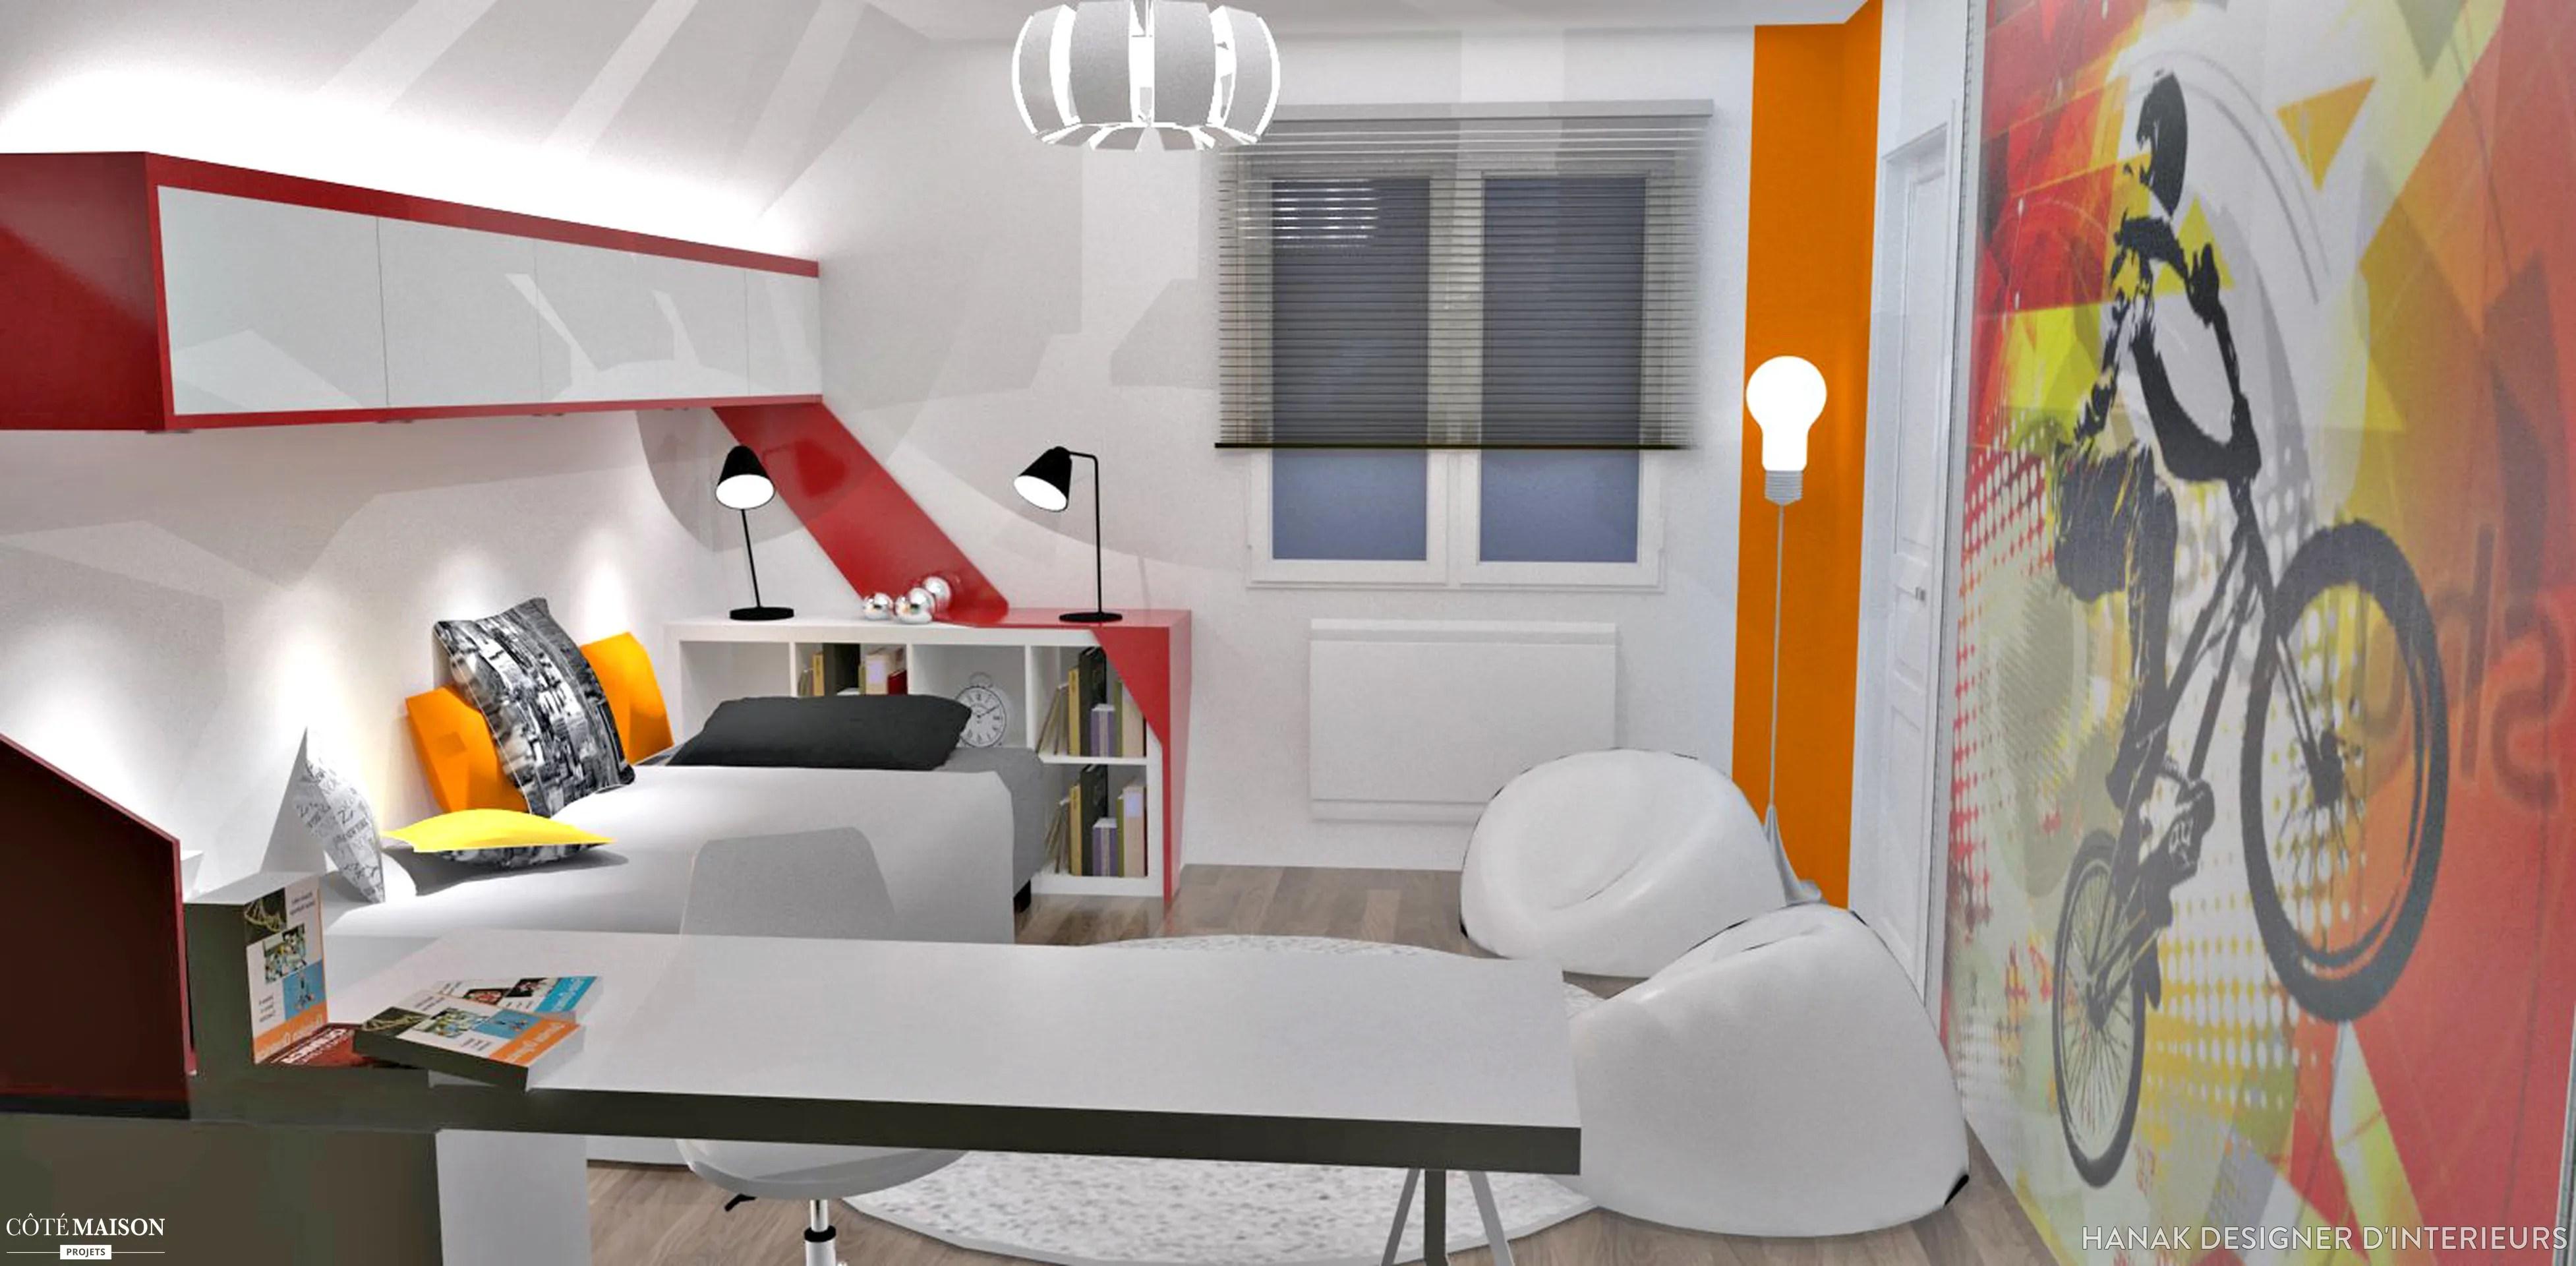 Chambres dado style sport  New York HanaK Designer dintrieurs  Ct Maison